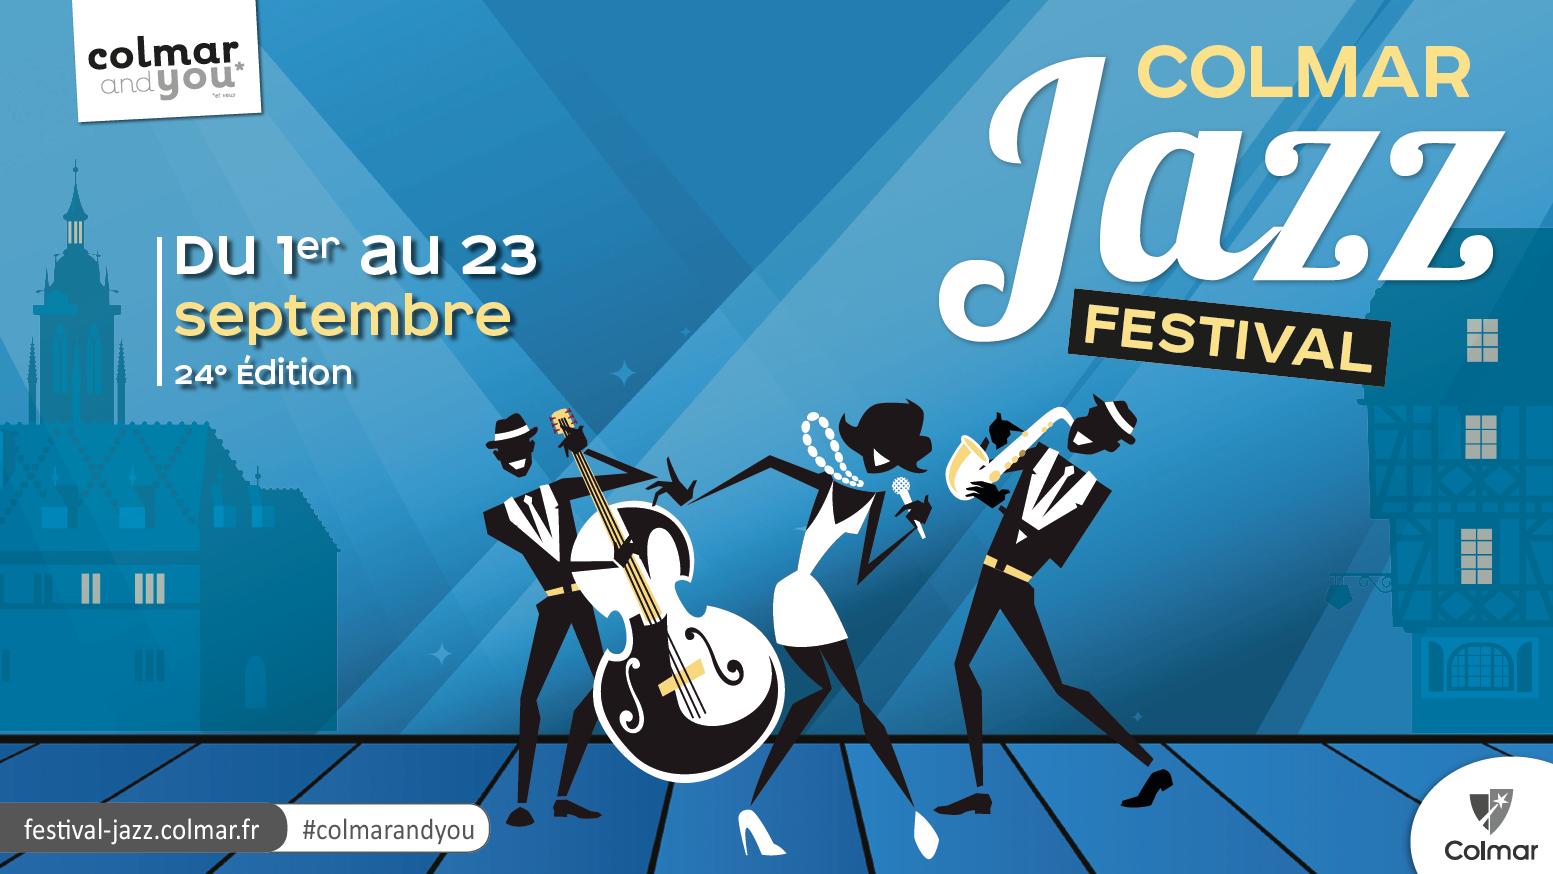 Festival_Colmar Jazz Festival_2019_szenik